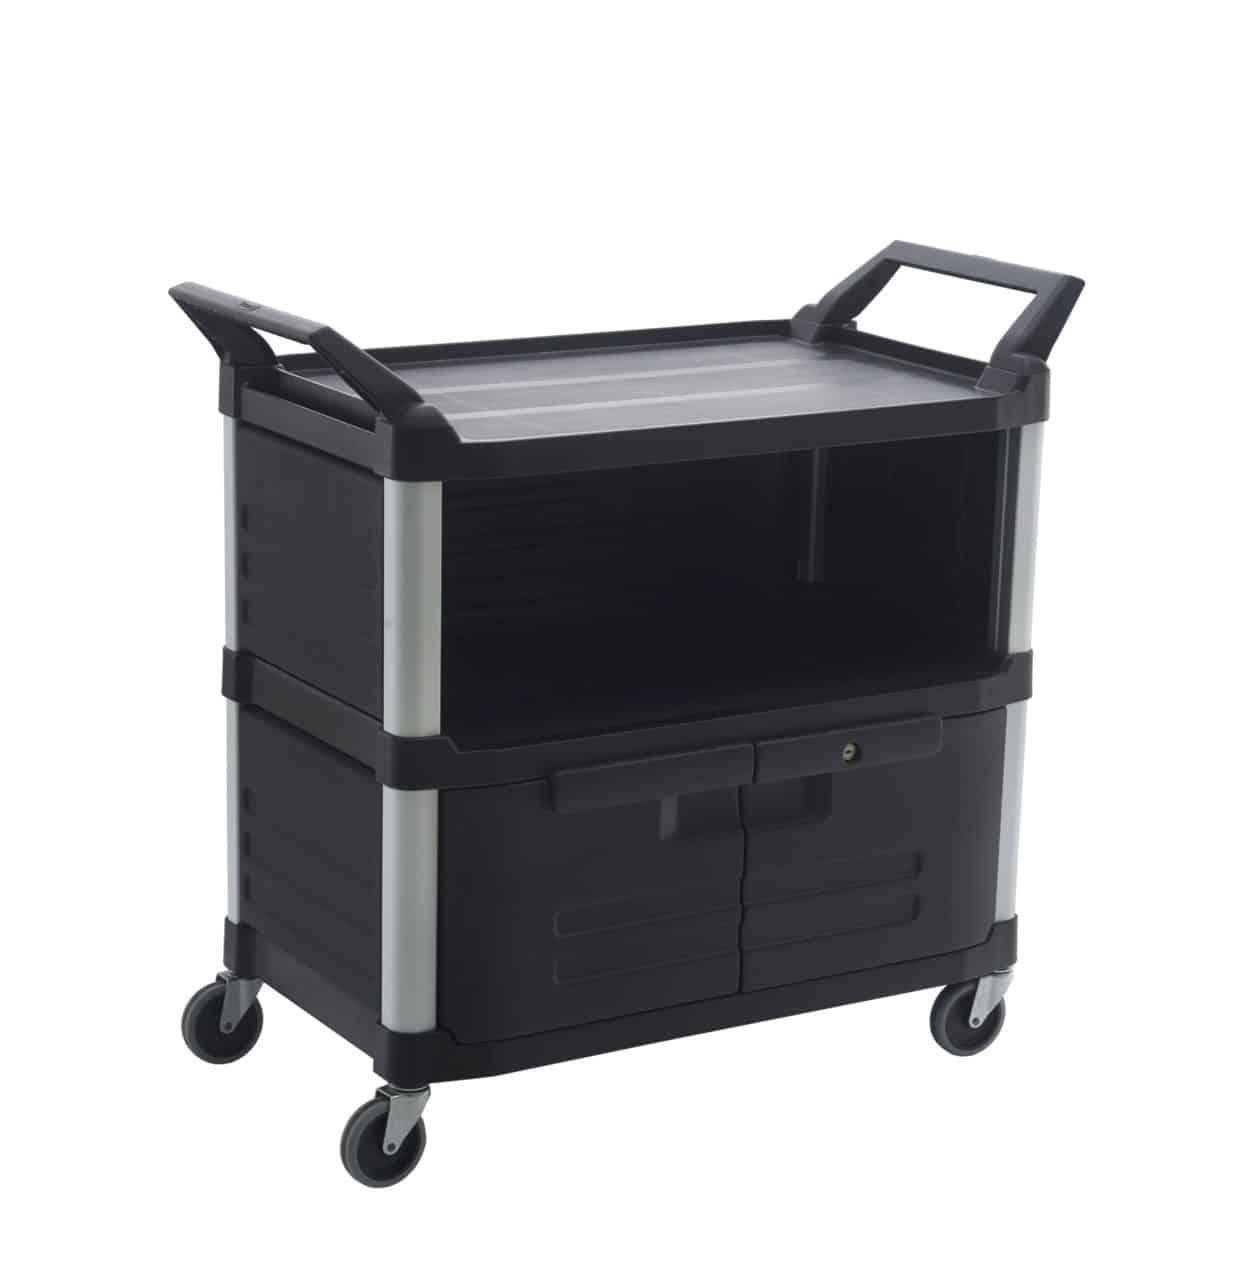 Enclosed Utility Service Cart